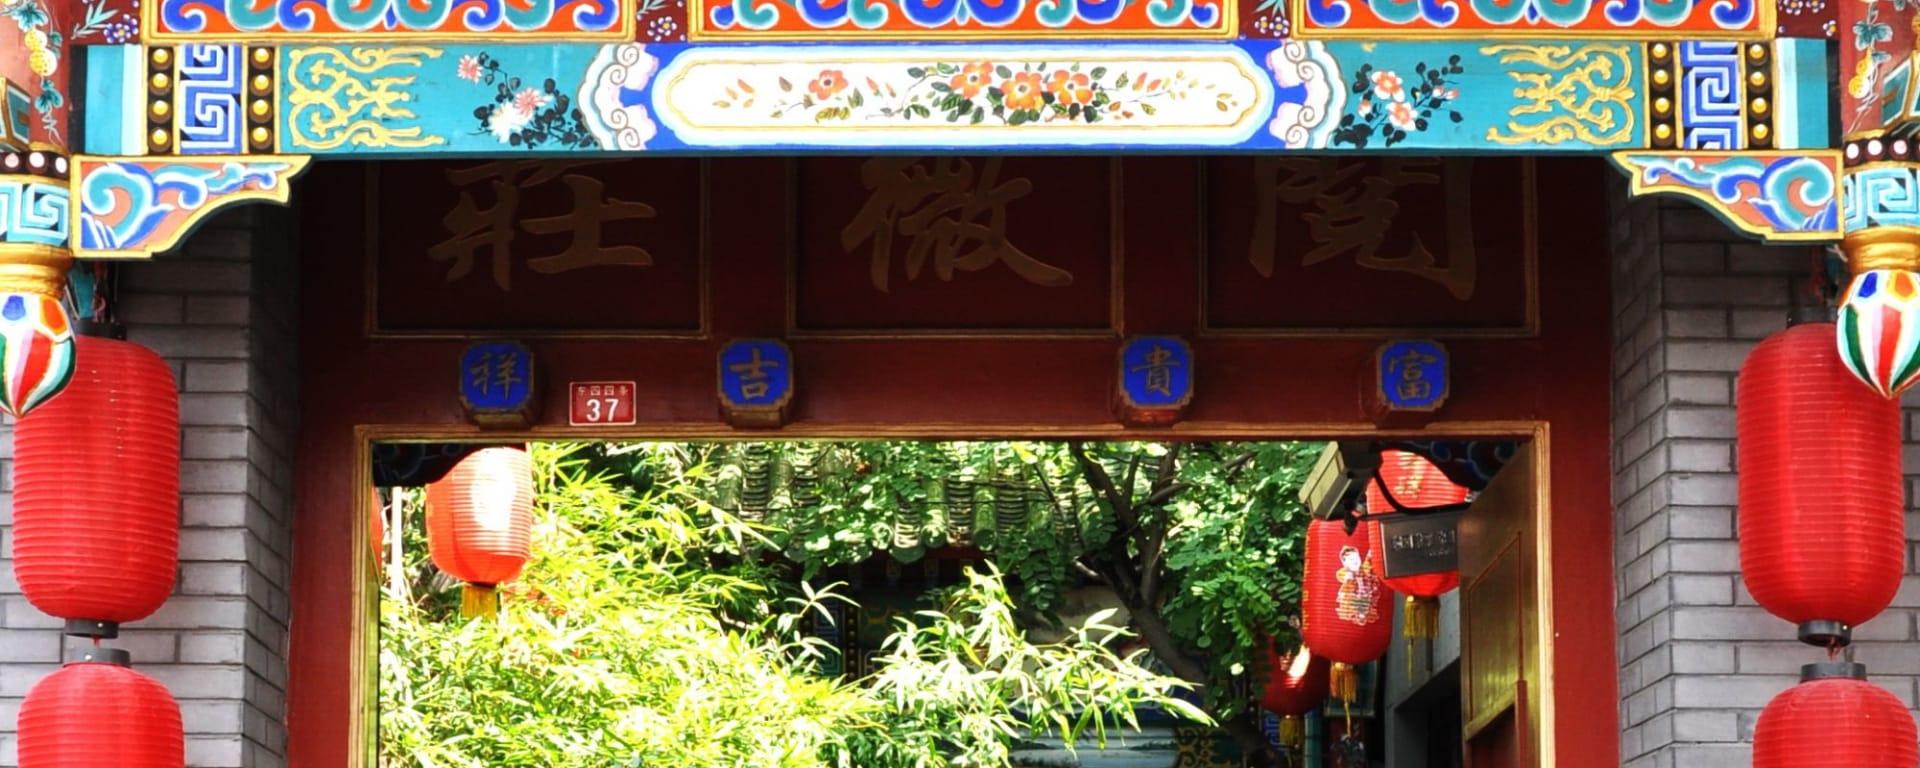 Beijing Double Happiness Courtyard in Peking: Entrance